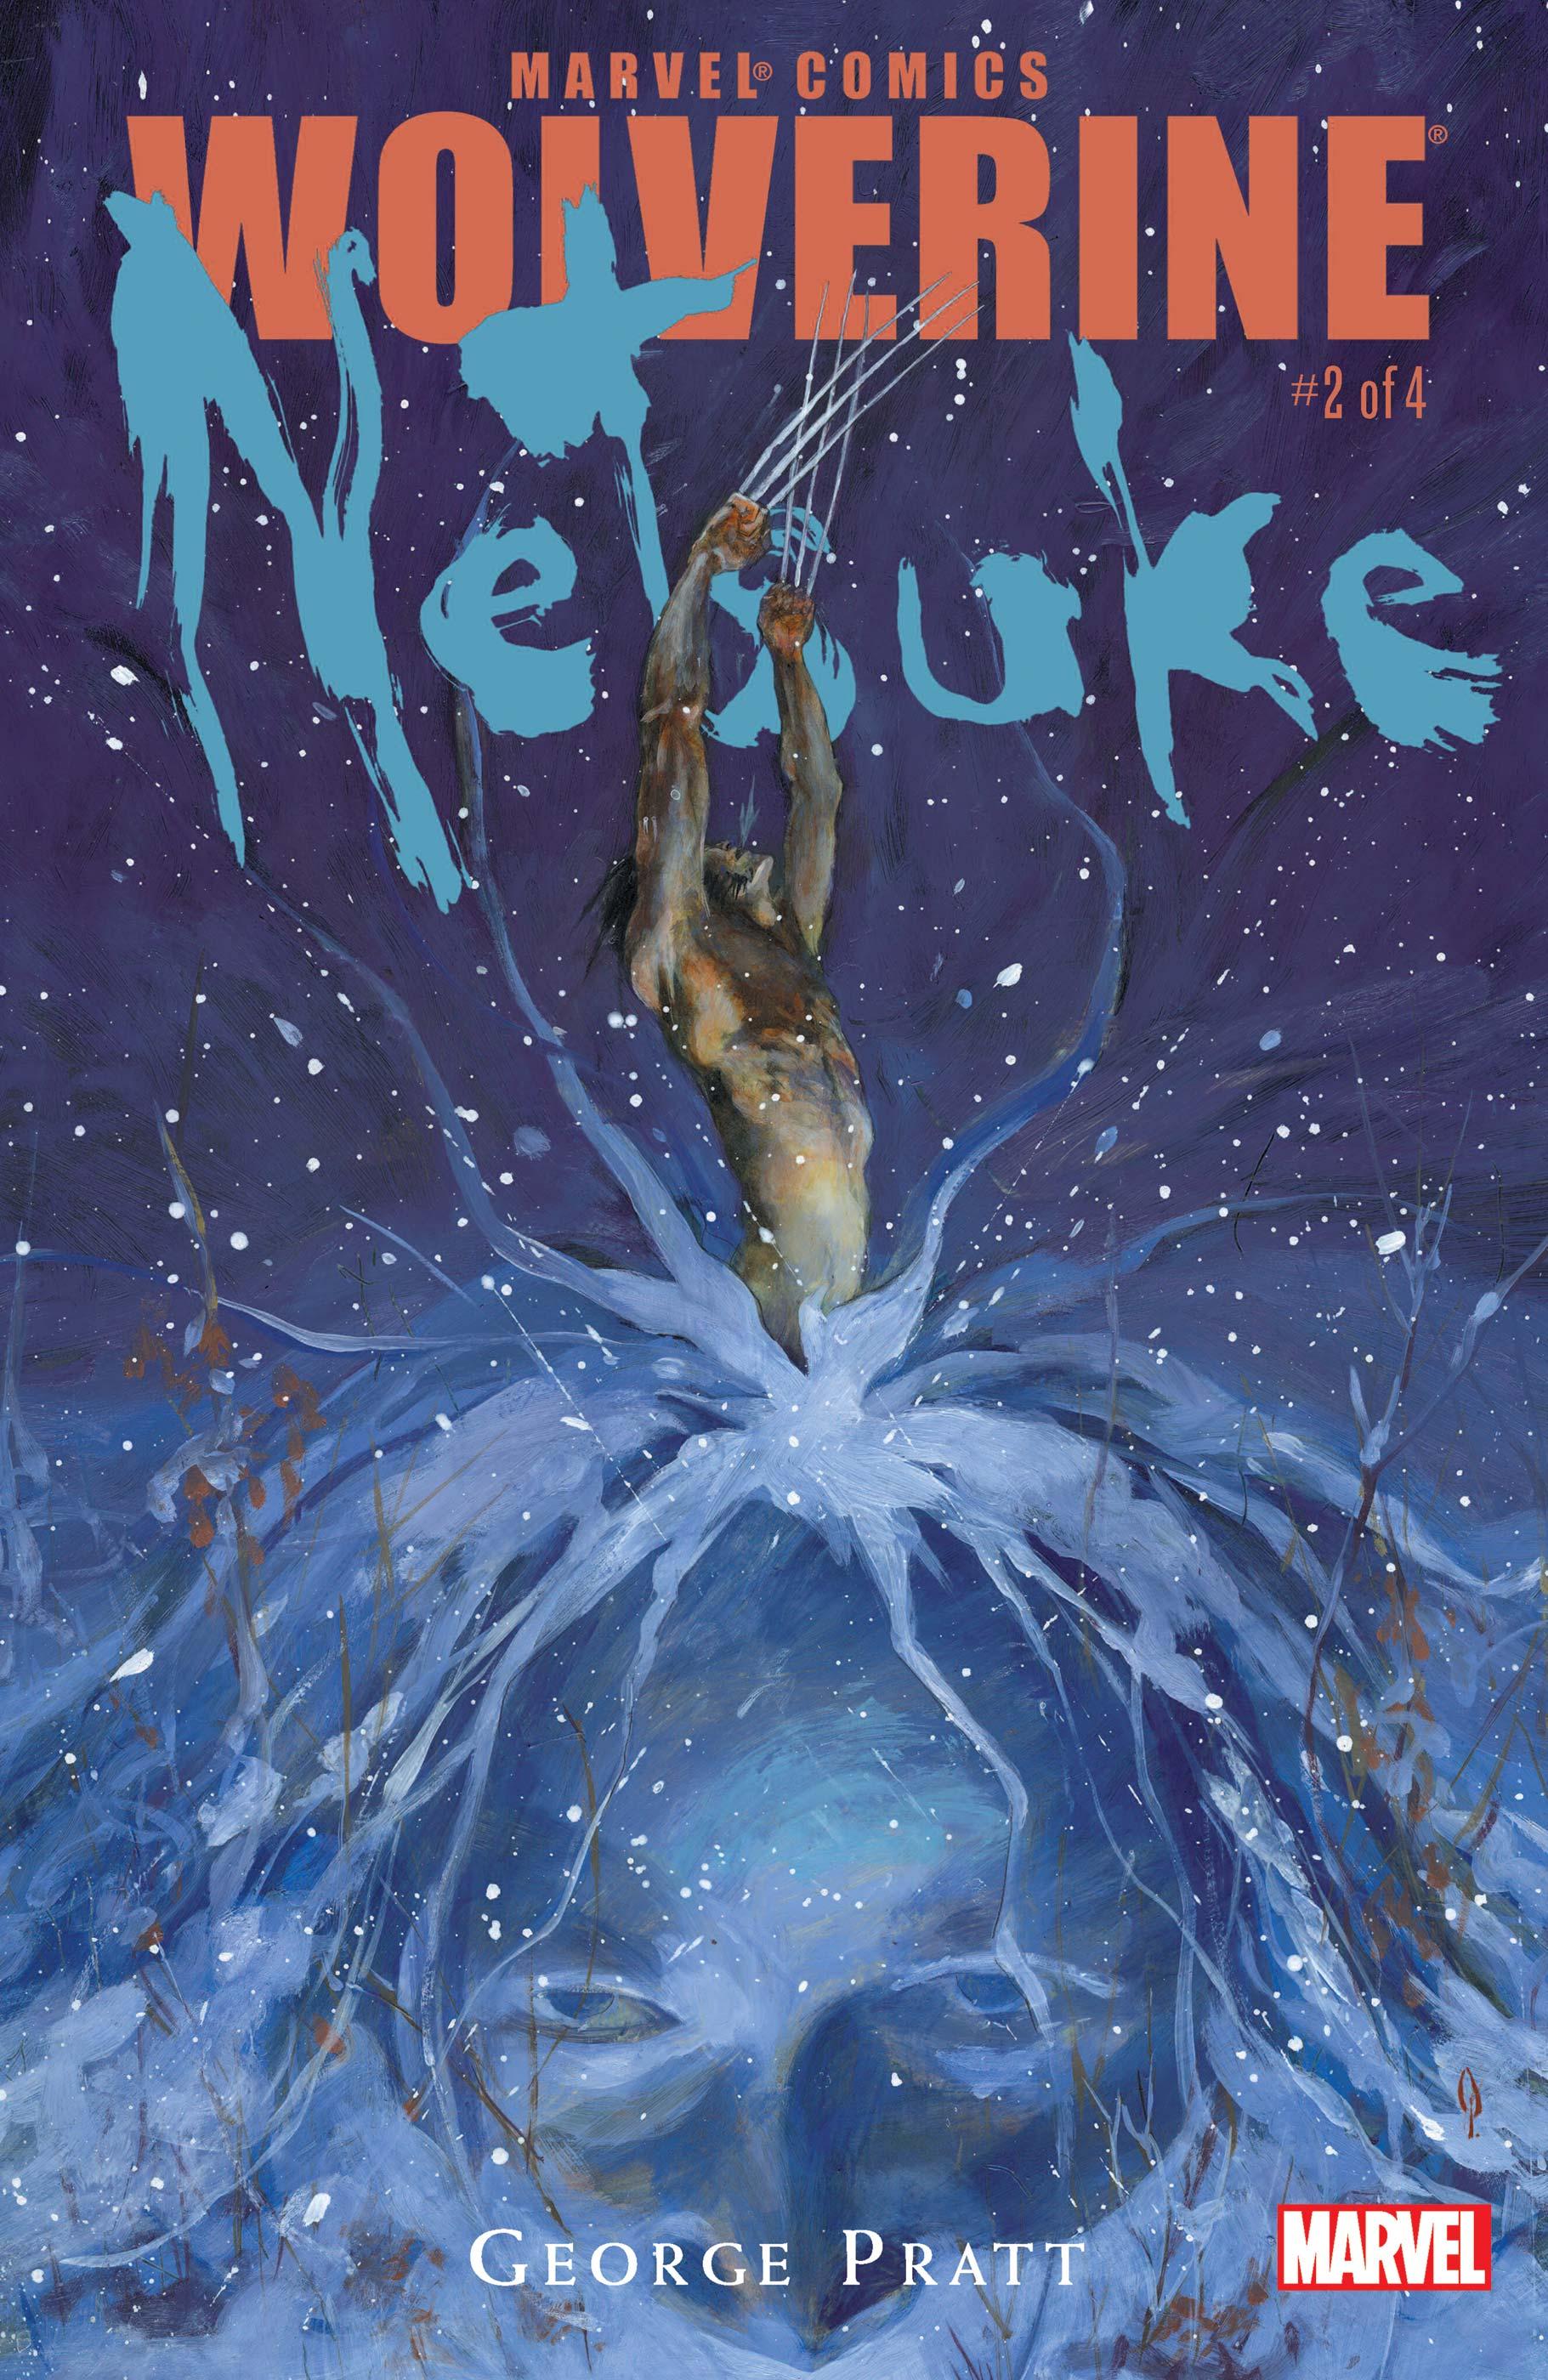 Wolverine: Netsuke (2002) #2